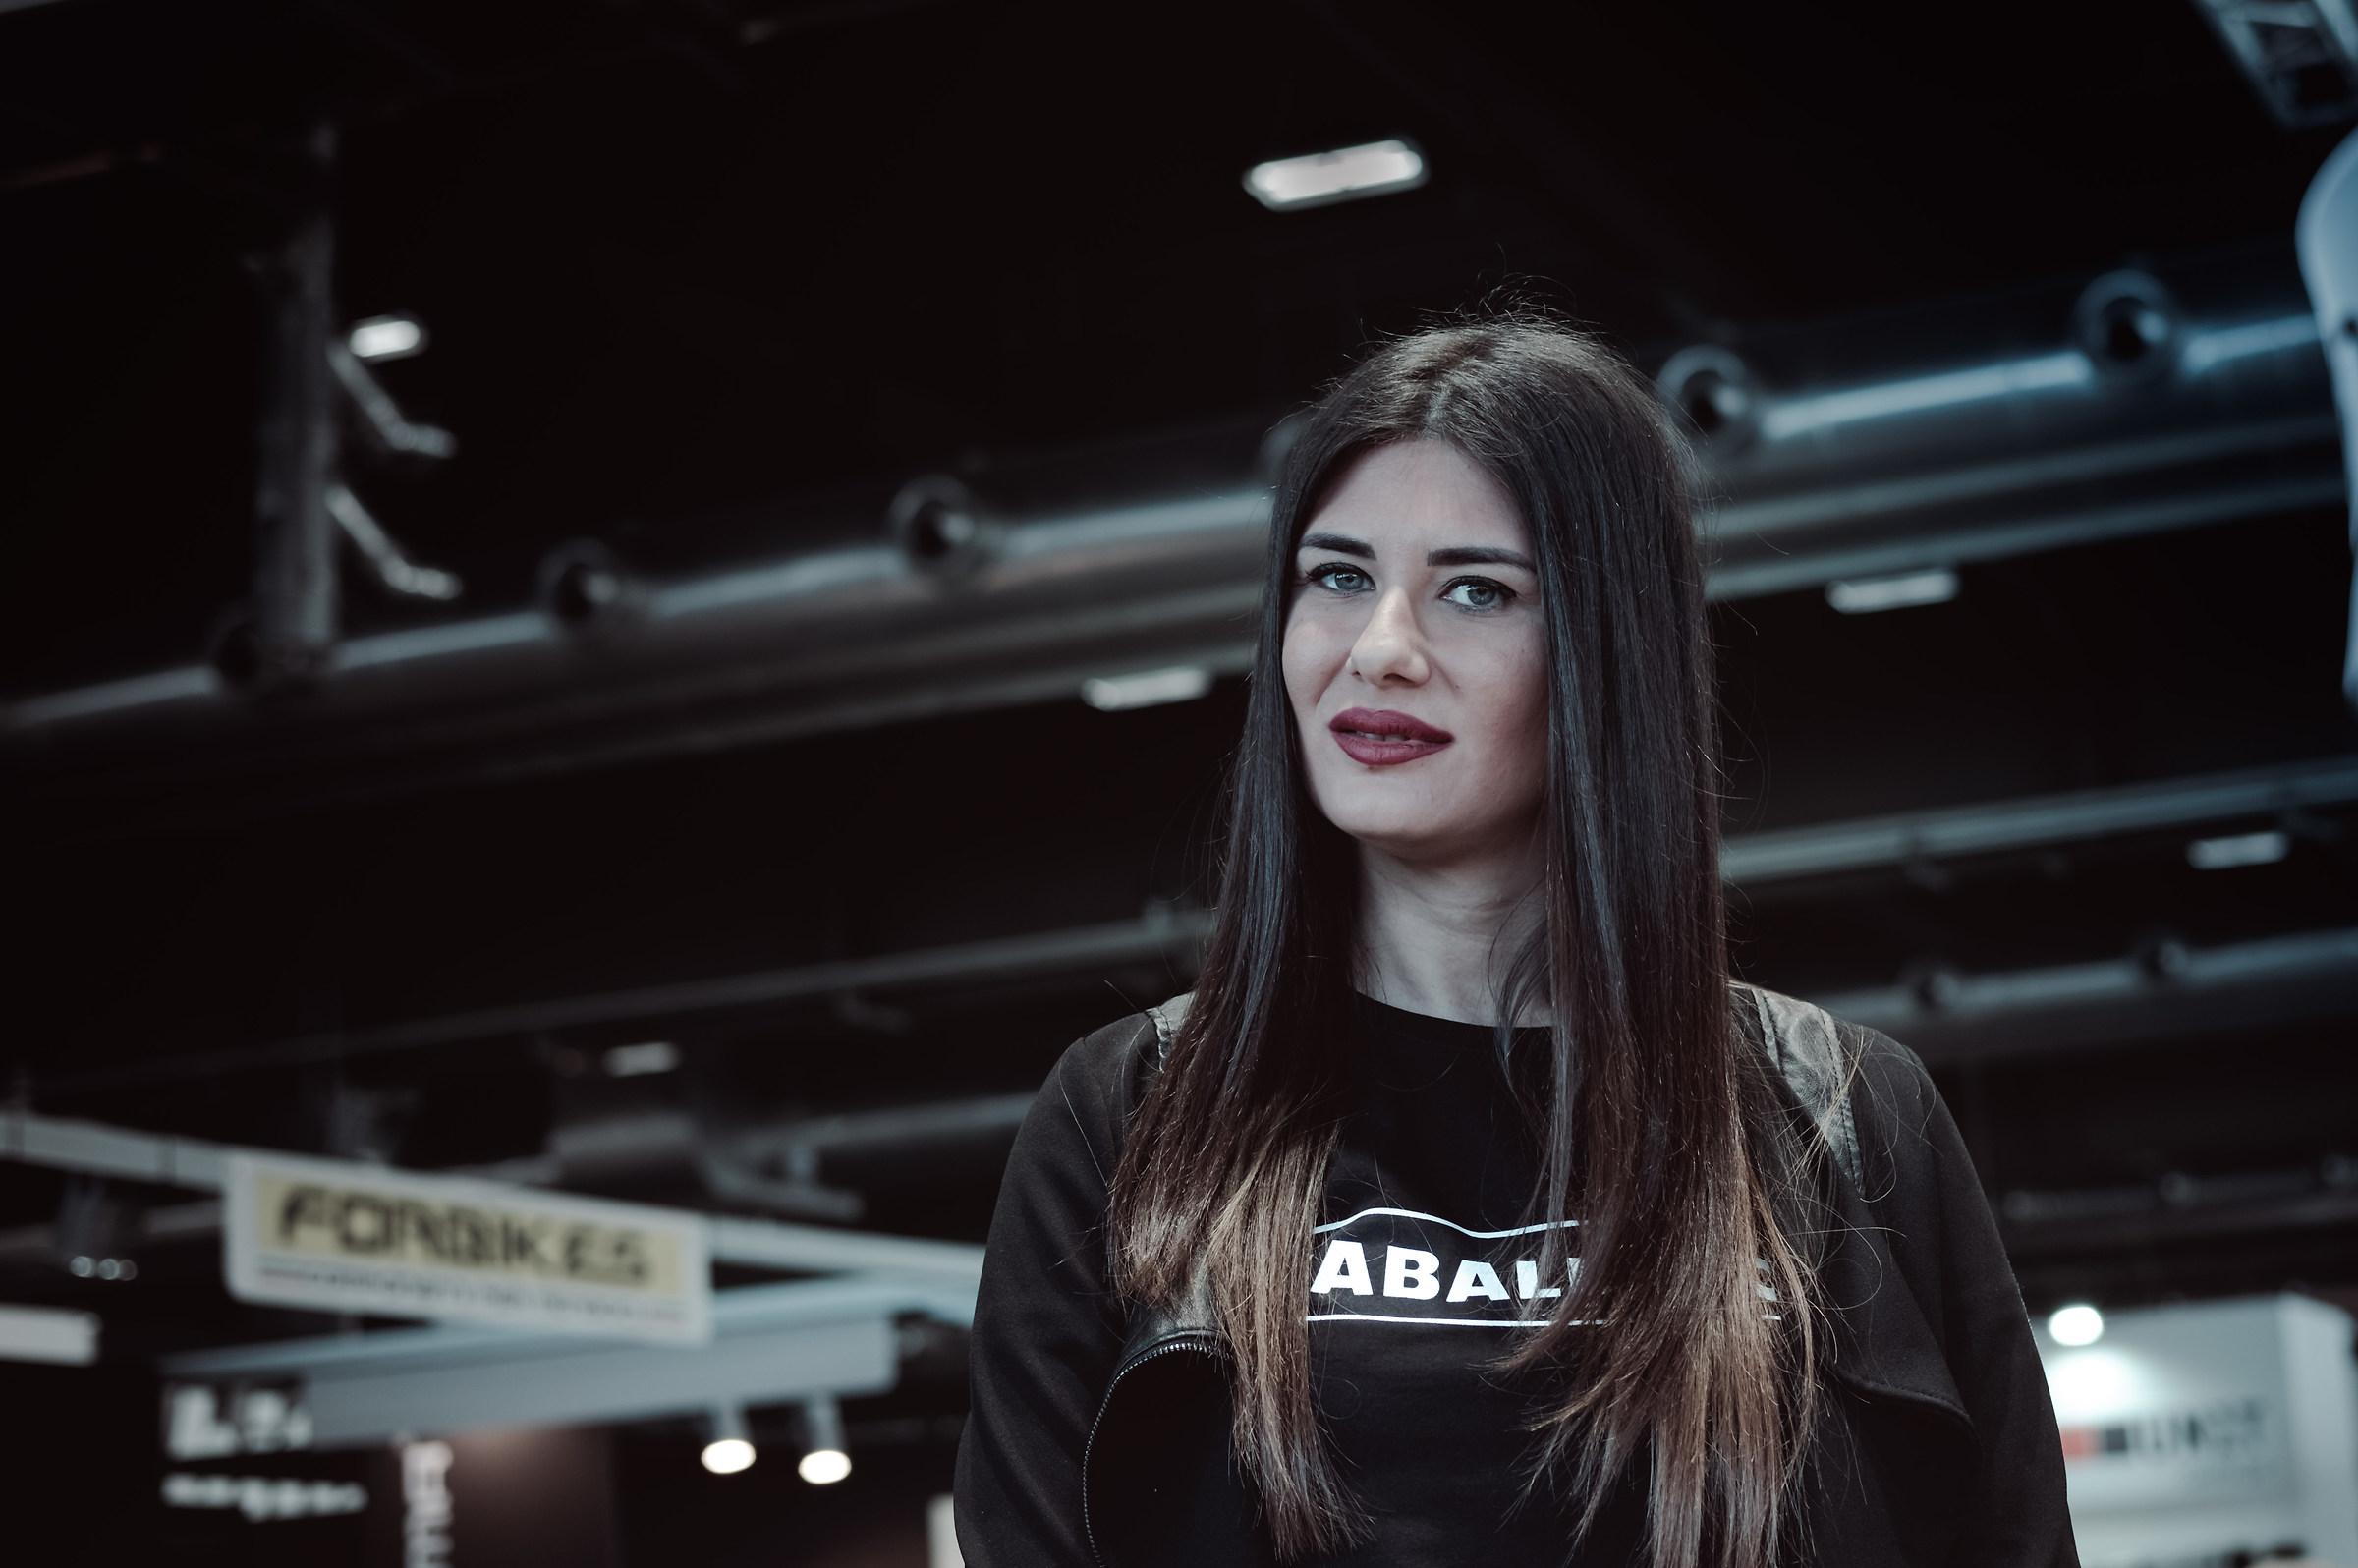 MotorBikexpo '2018 Verona...